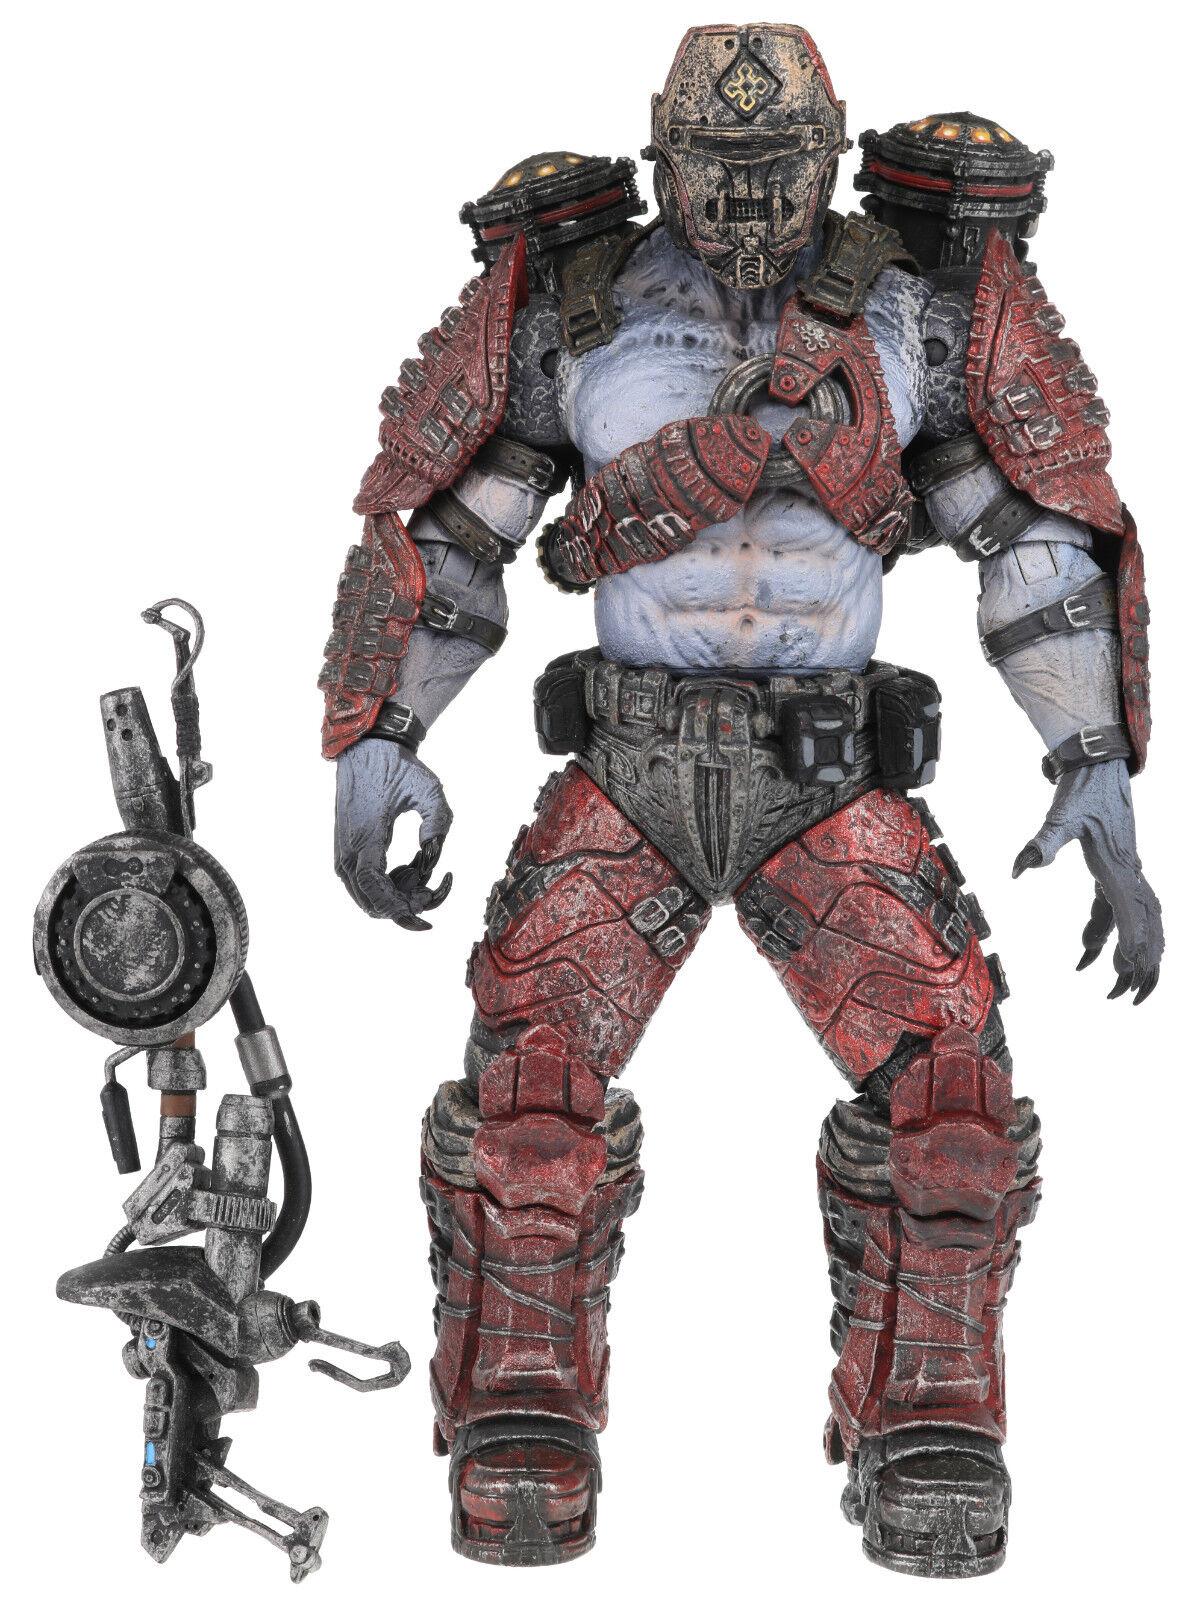 Gears of War GOW Series 4 GRENADIER FLAME THROWER Action Figure NECA 2009